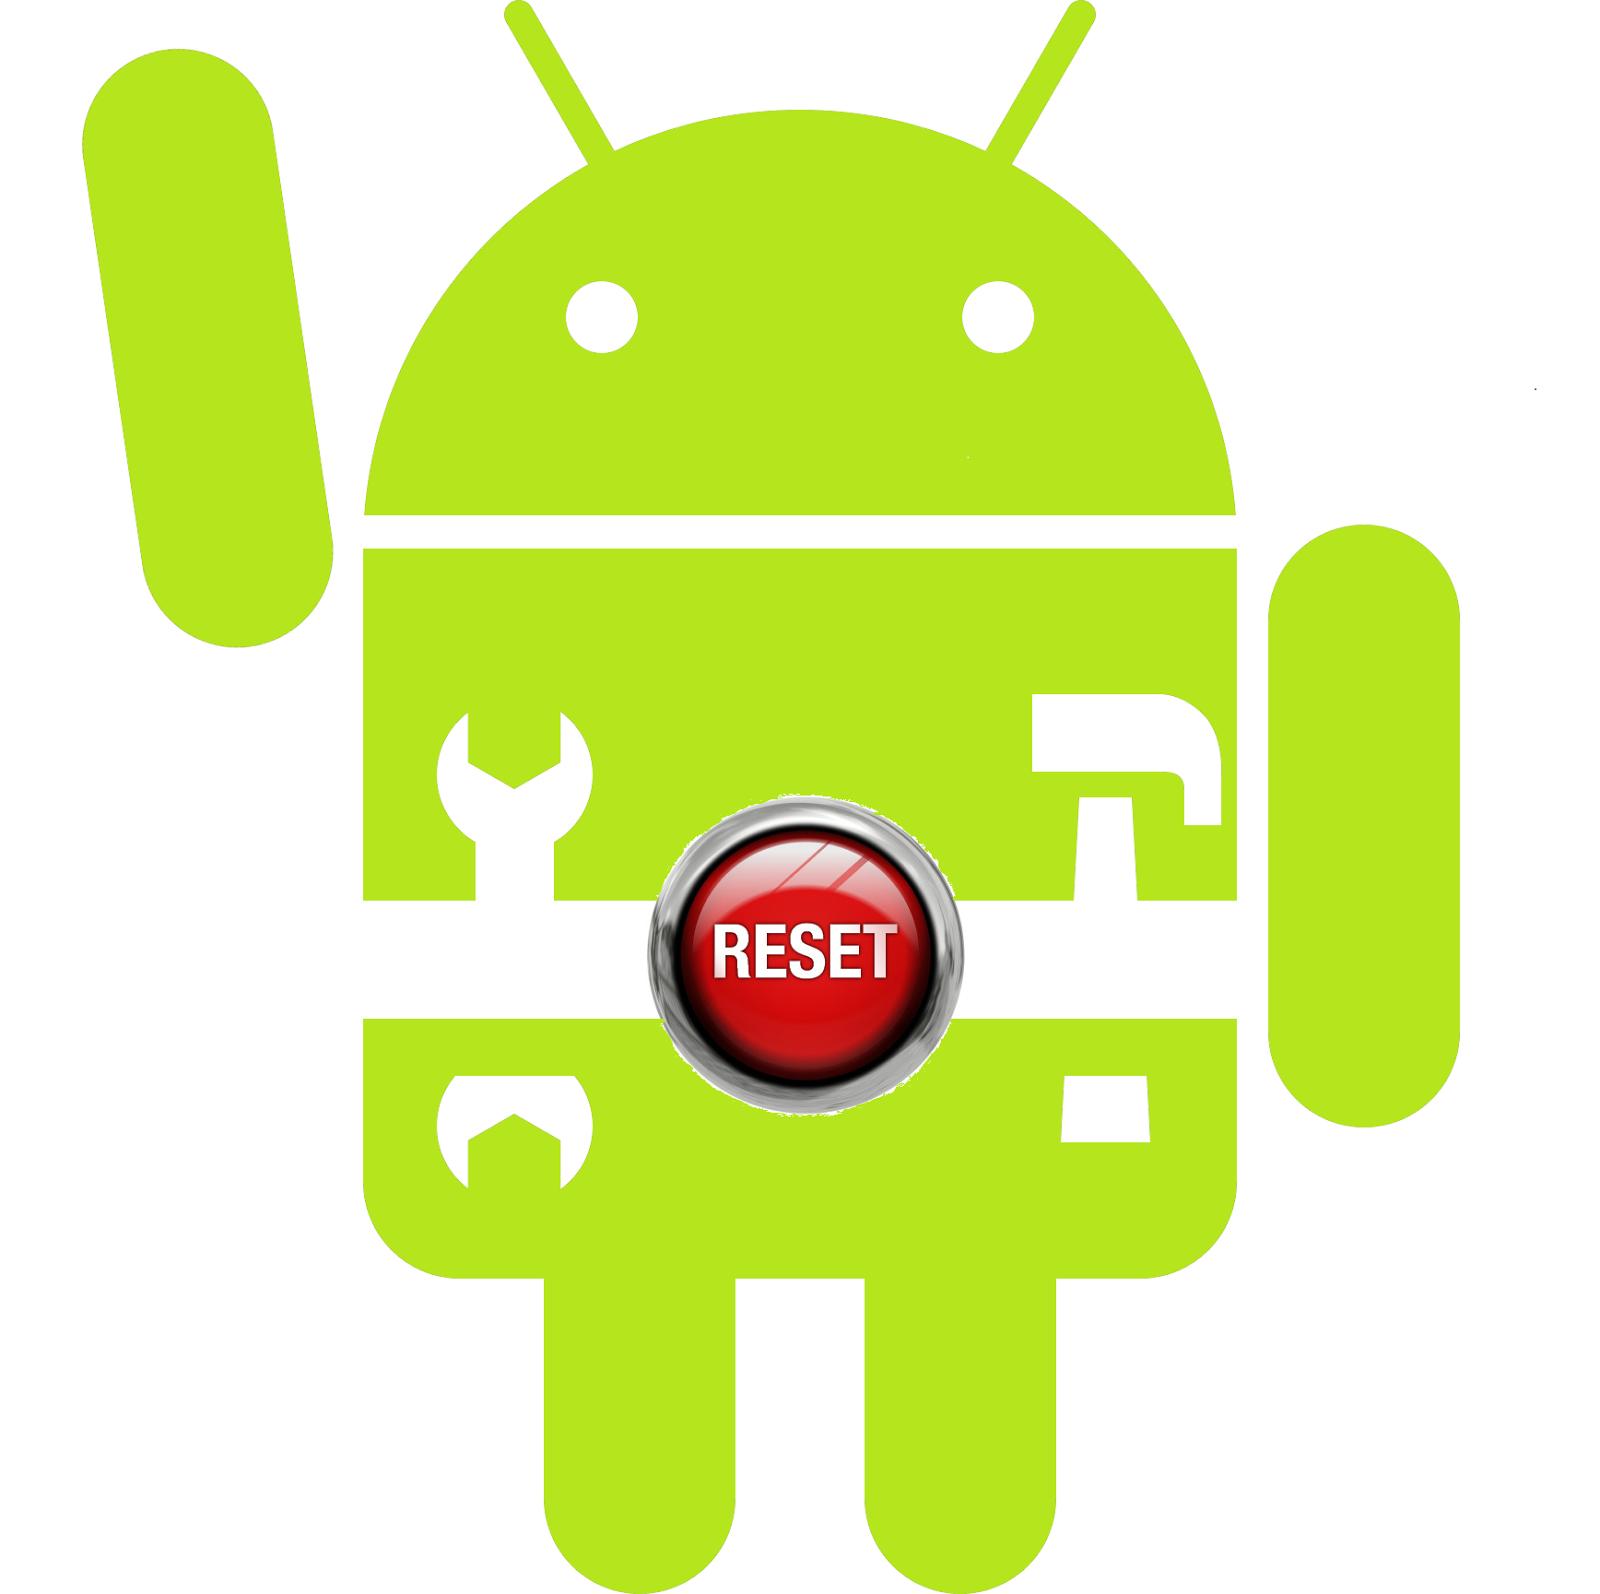 Cara instal ulang android semua tipe